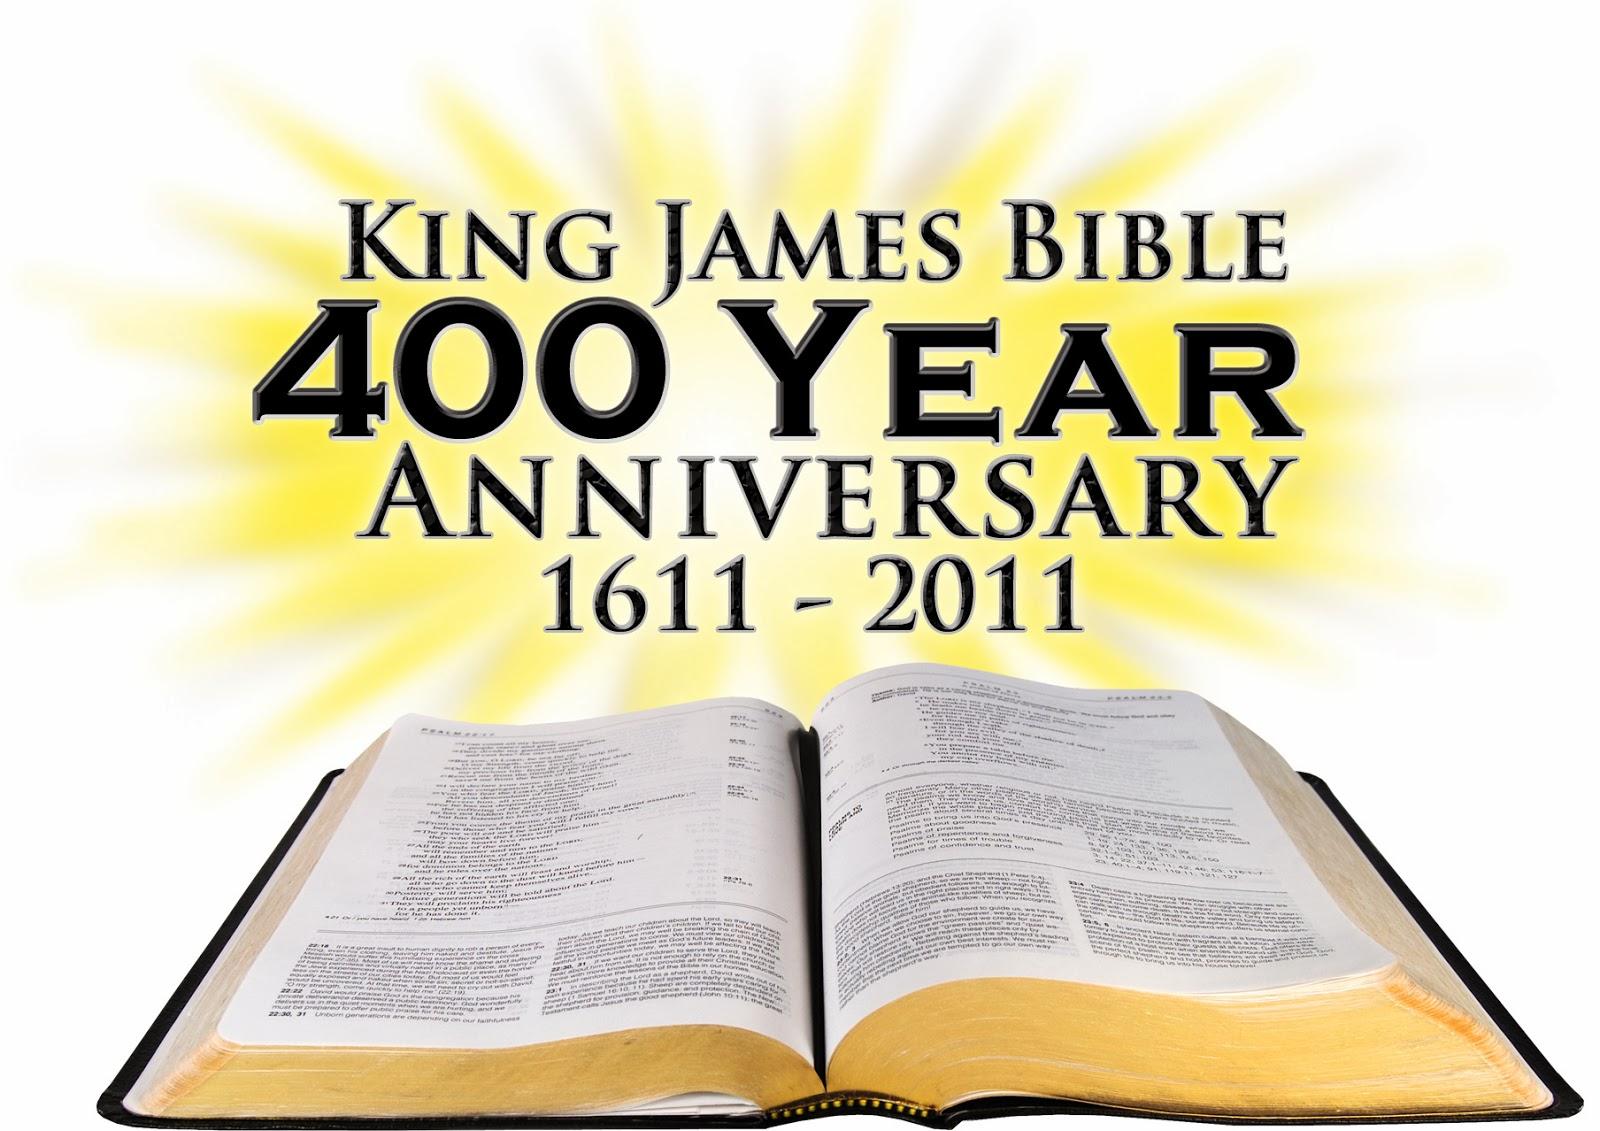 King James Bible - 400 Year Anniversary - 1611- 2011